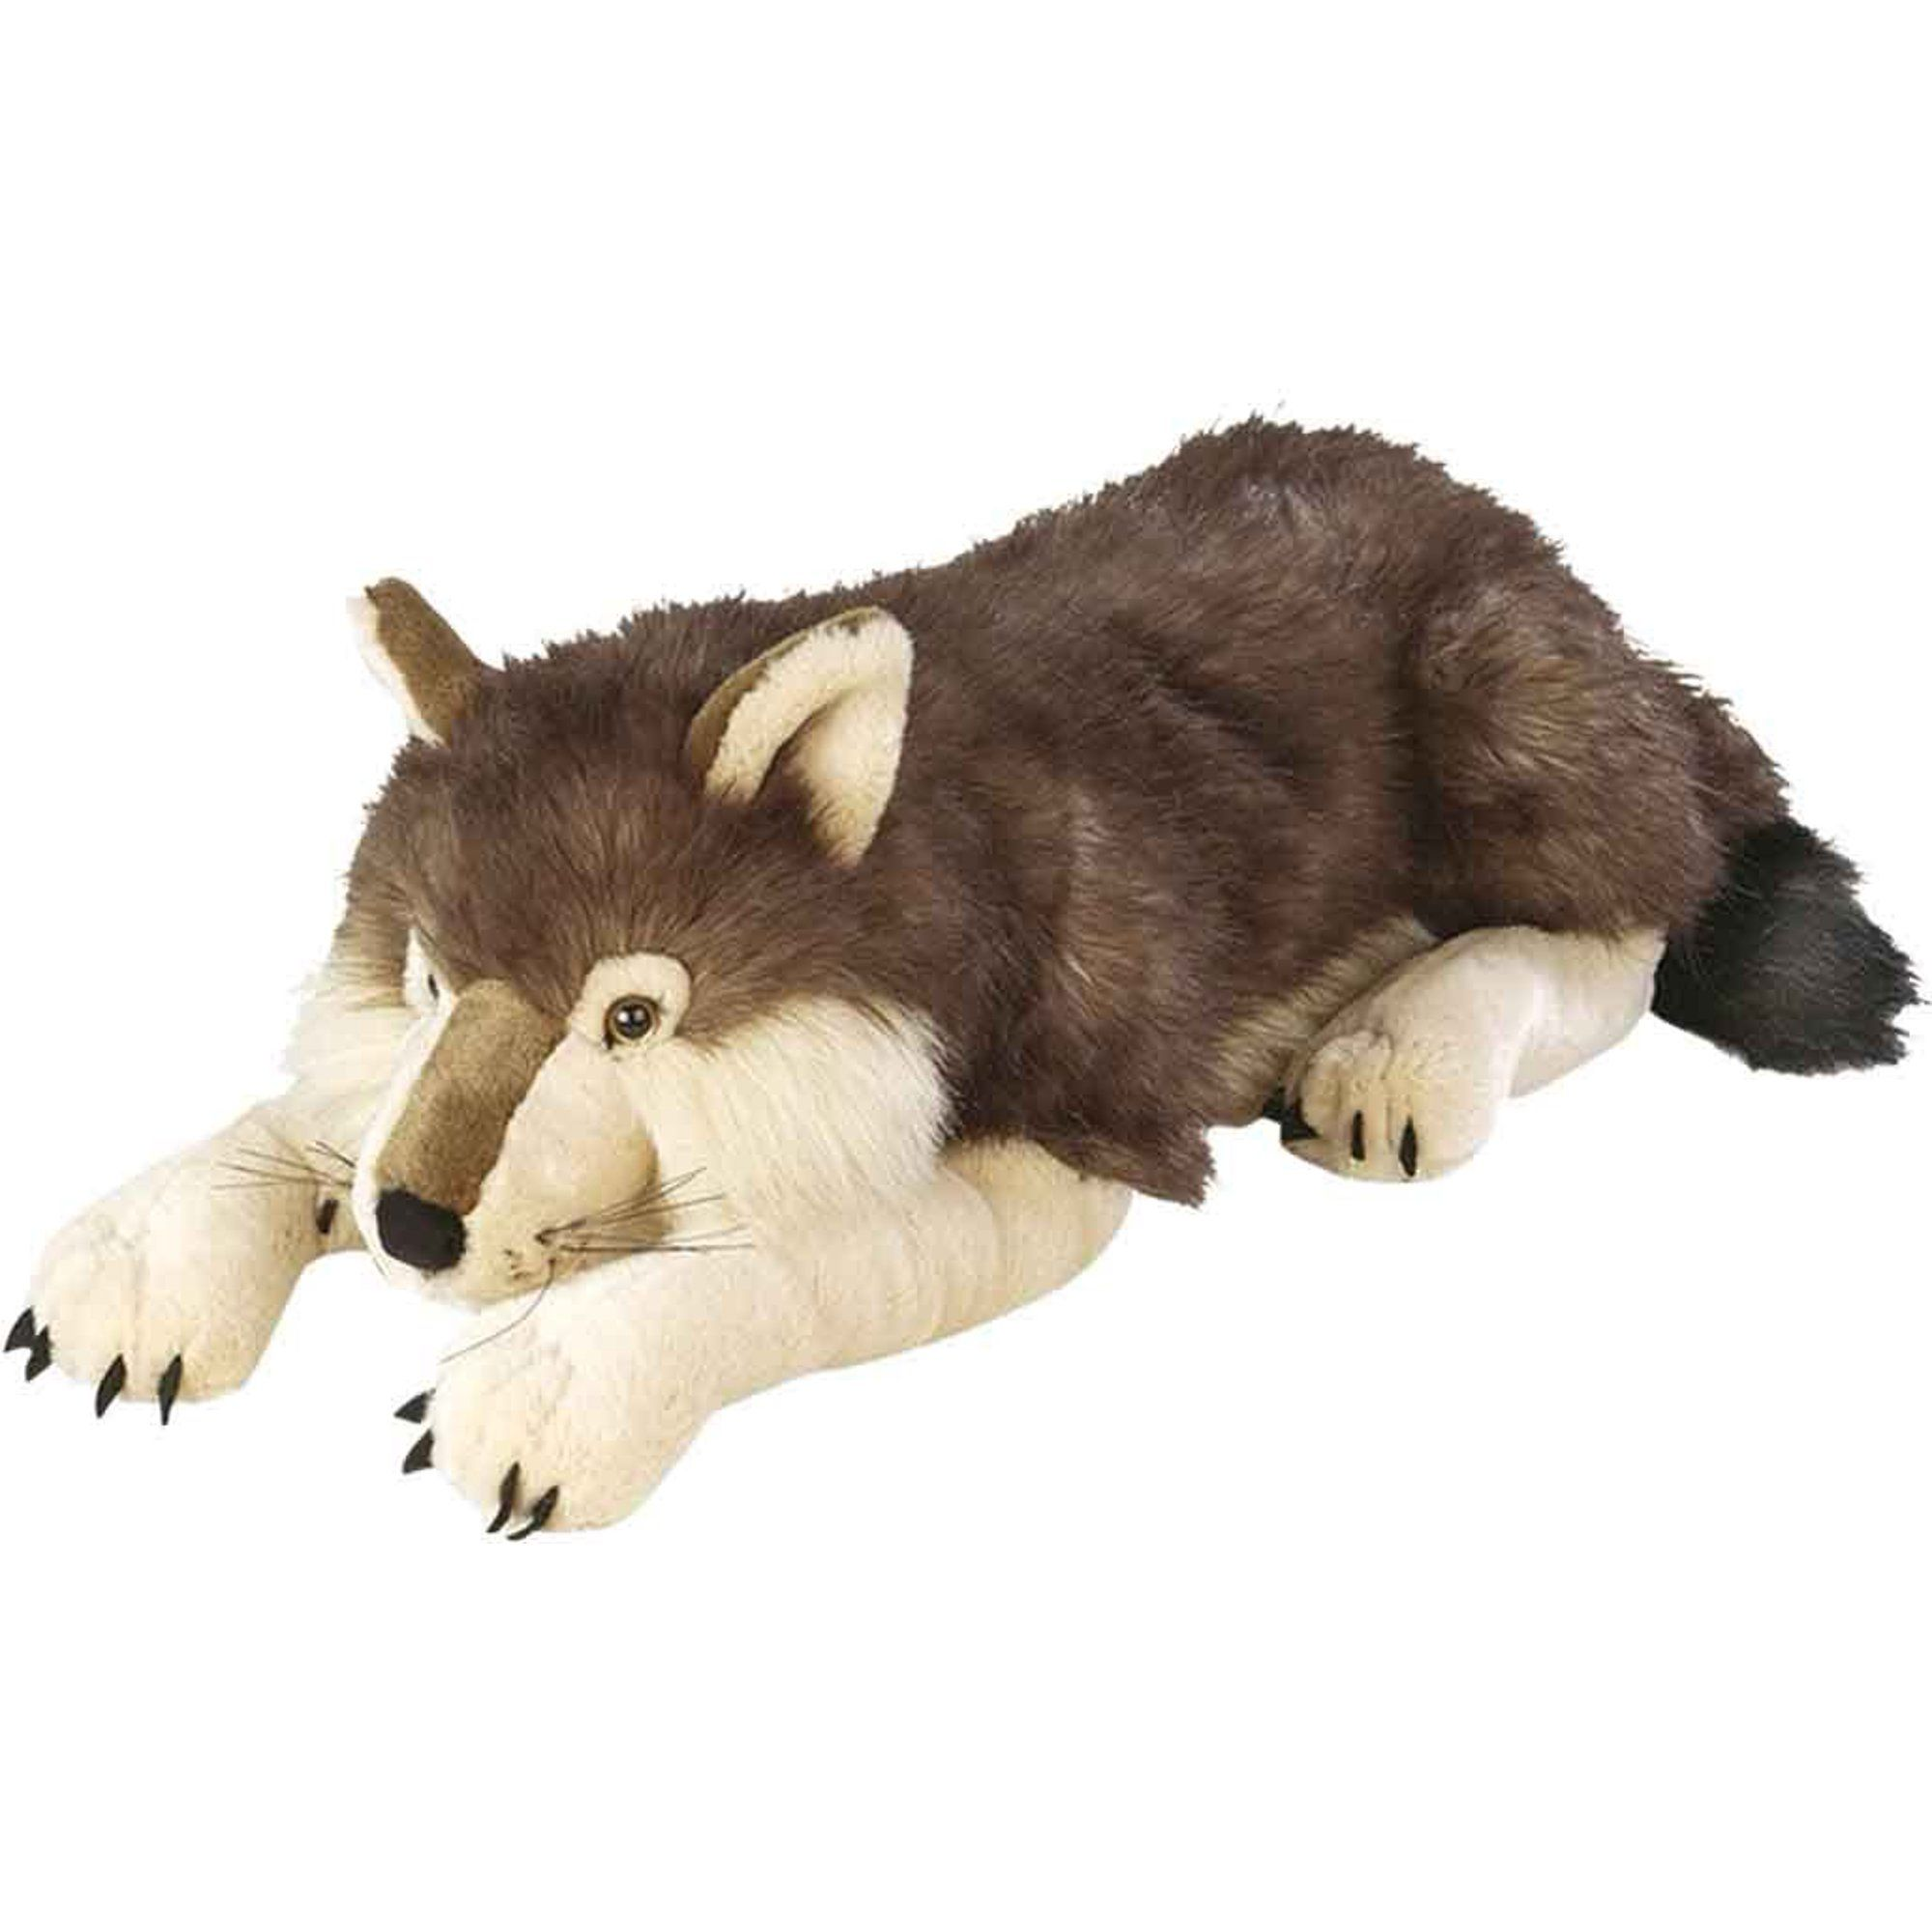 Wild Republic Cuddlekins Jumbo Wolf 30 Inches Gift For Kids Gift For Nature Lovers Room Decor Walmart Com In 2021 Wolf Stuffed Animal Wolf Plush Giant Stuffed Animals [ 2000 x 2000 Pixel ]